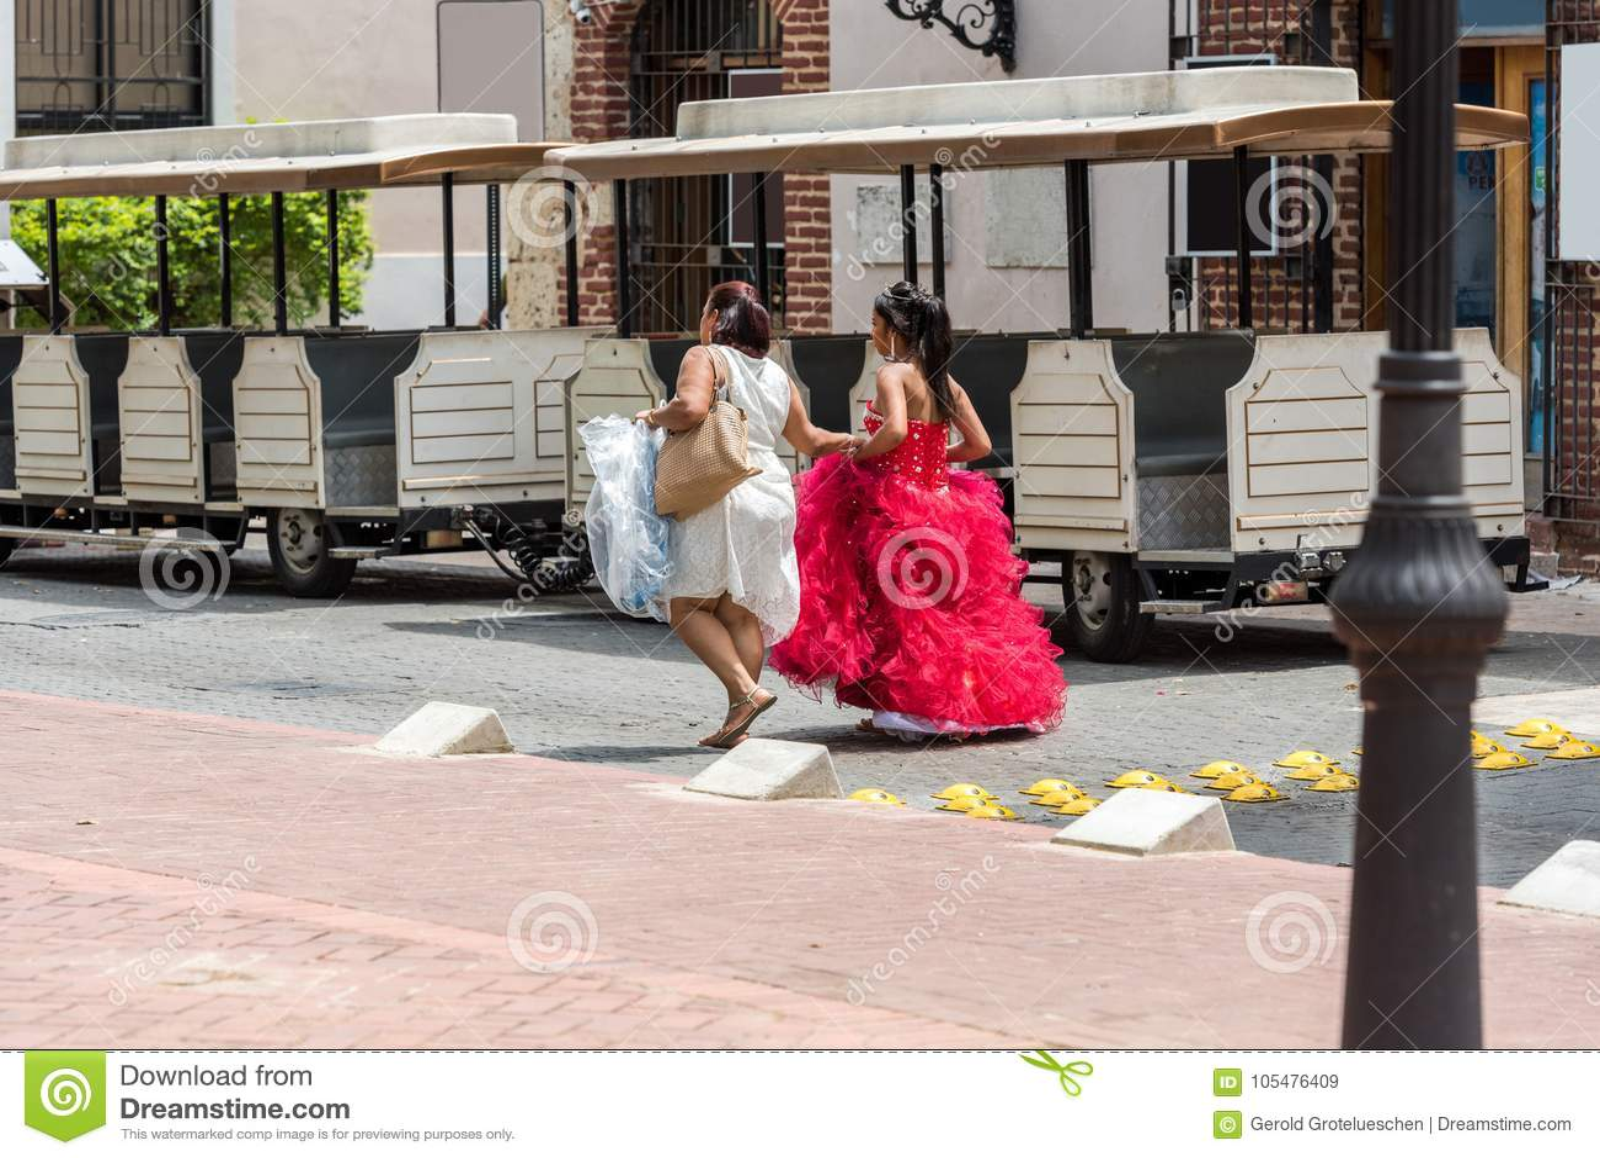 Domingo women santo An Introduction